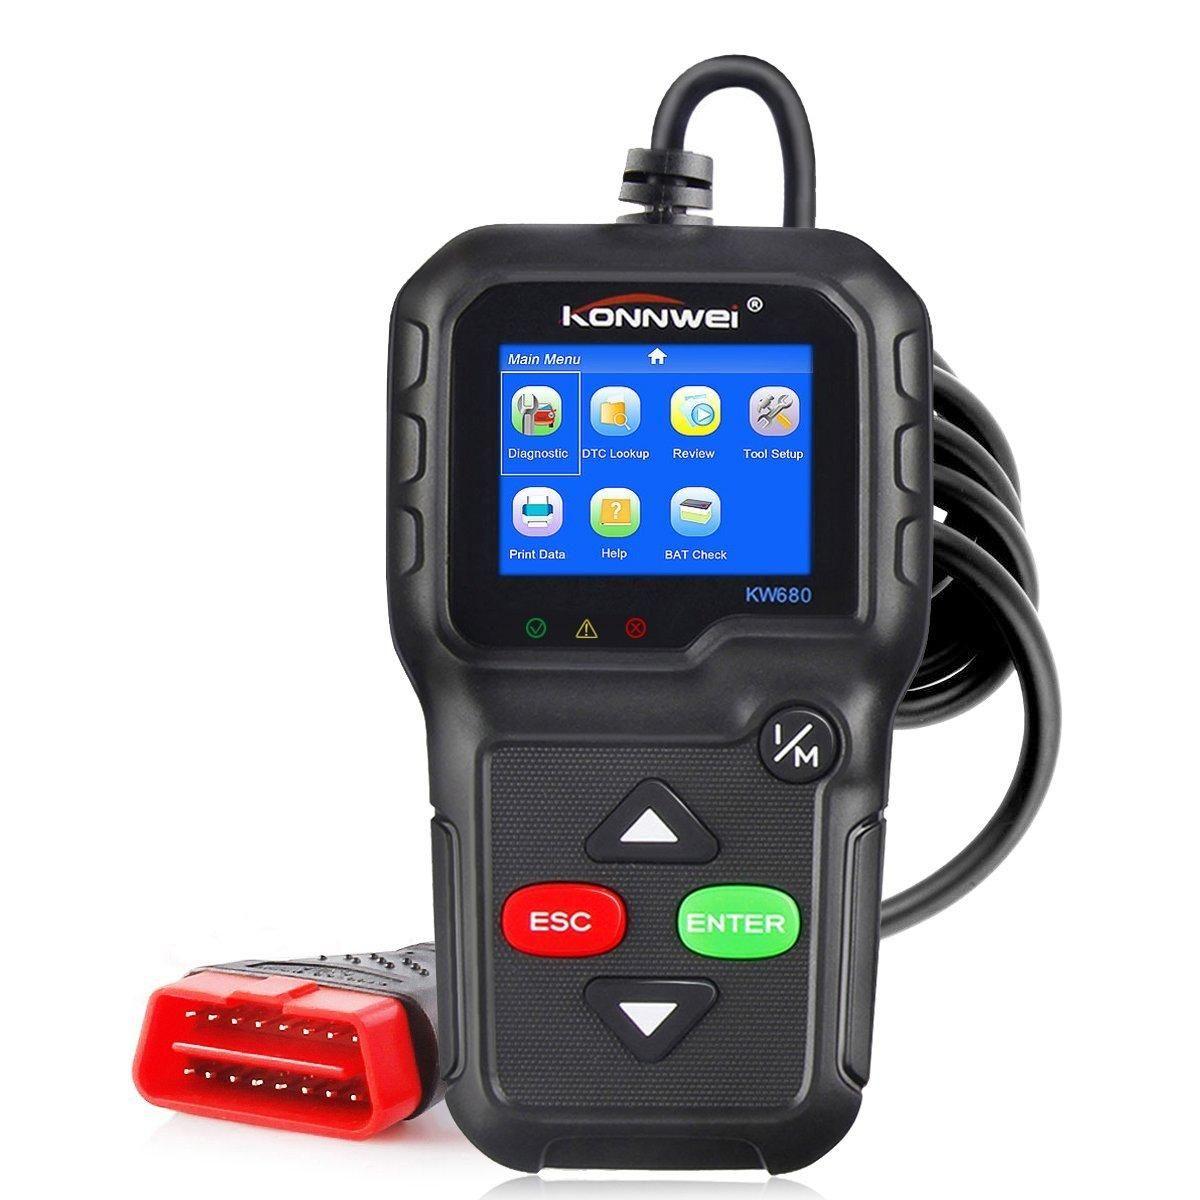 SXW US$47.99 KONNWEI KW680 OBD2 Code Reader Universal Car Diagnostic Scanner Tool Full OBDII EOBD Functions